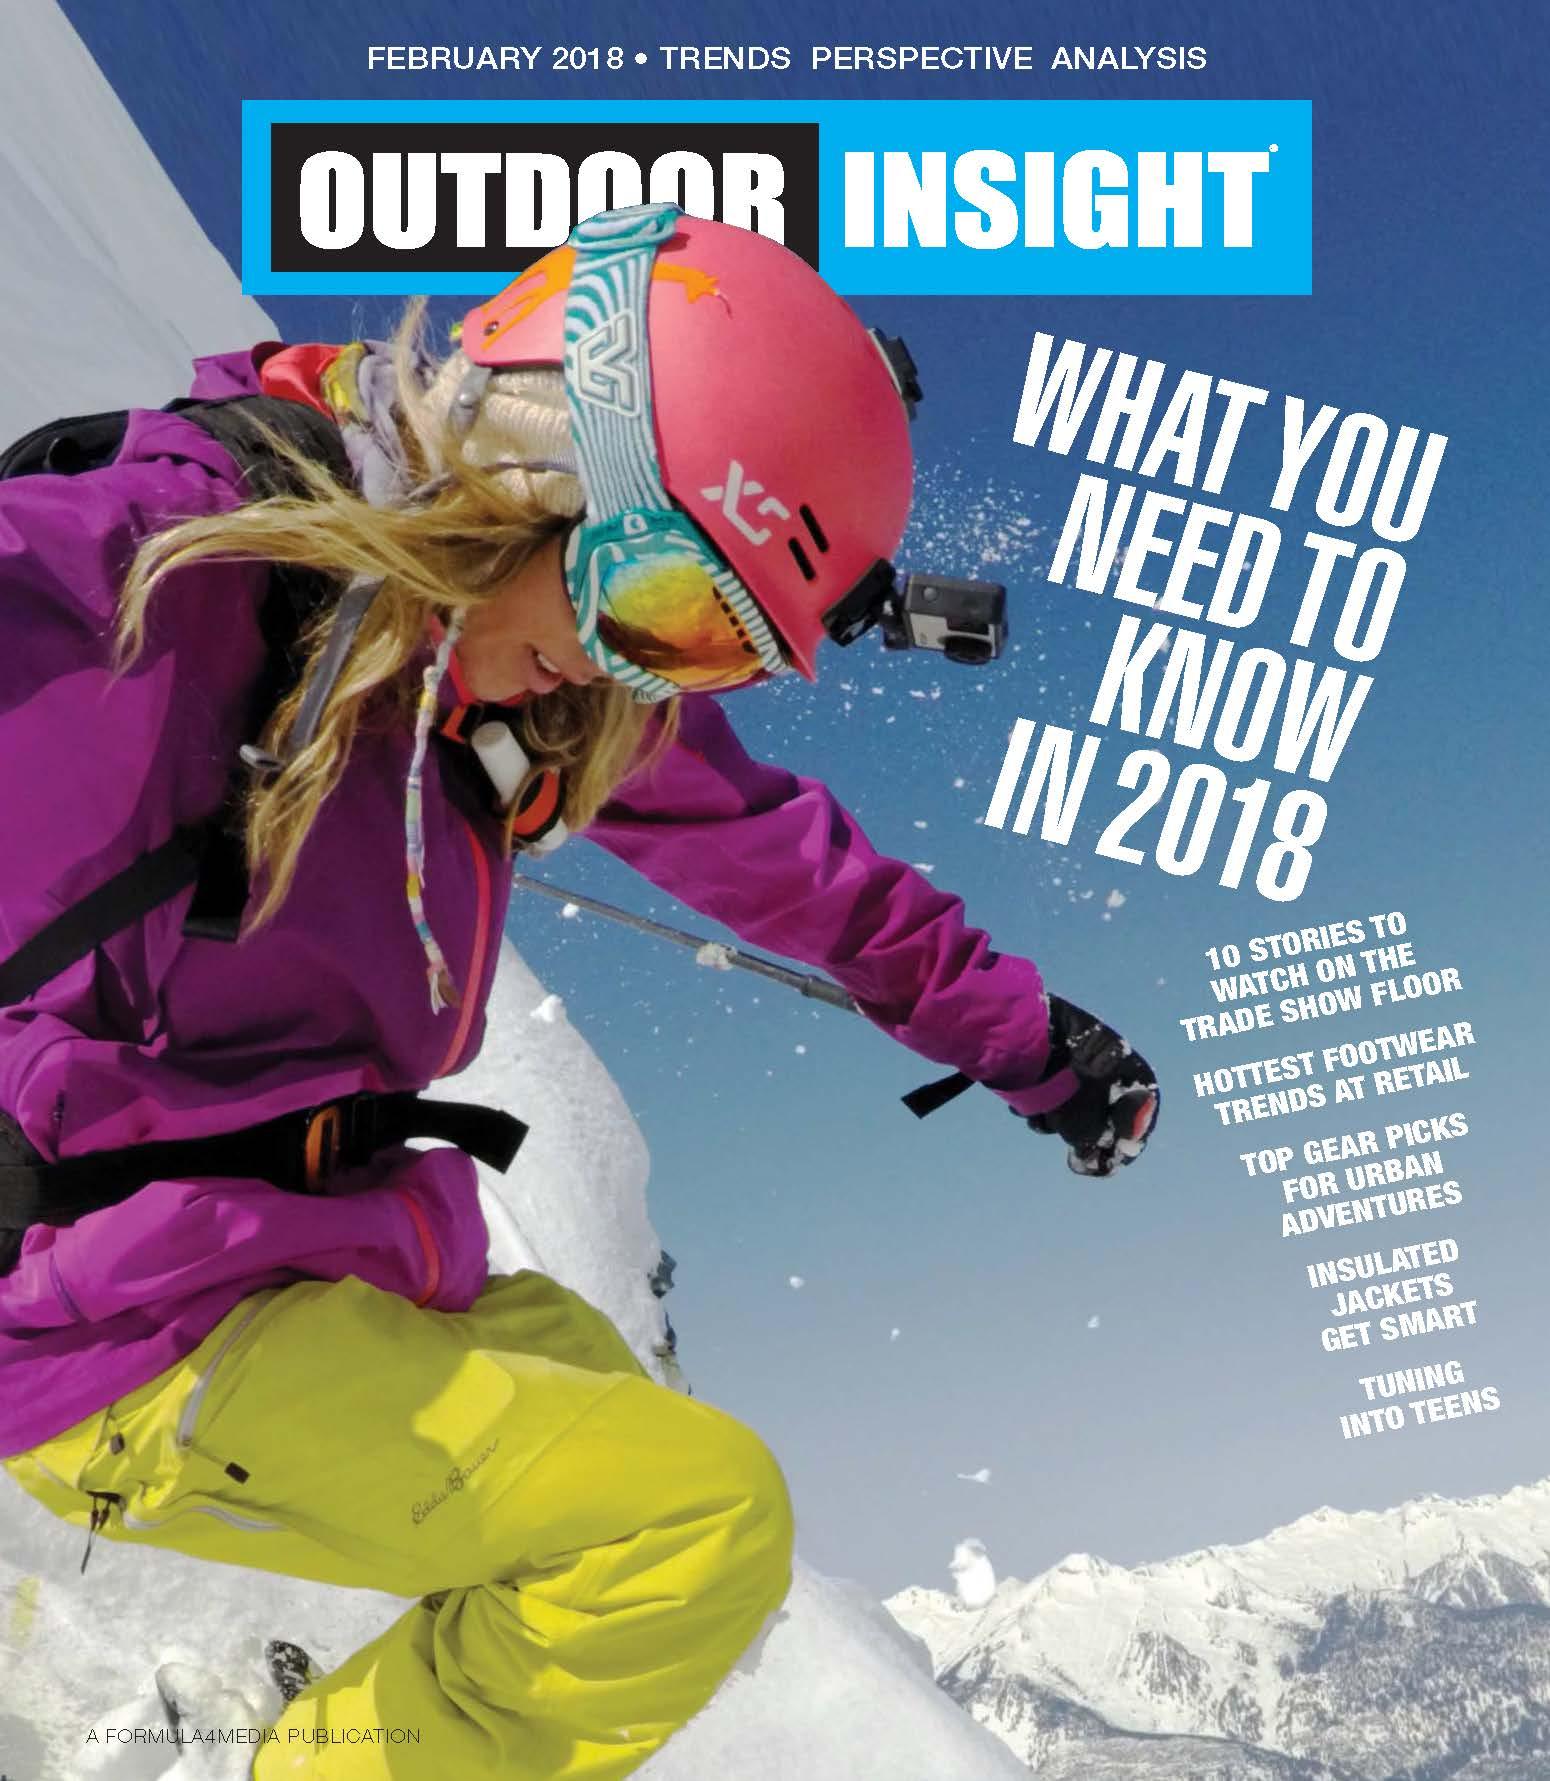 outdoor-insight-february-2018 1.jpg